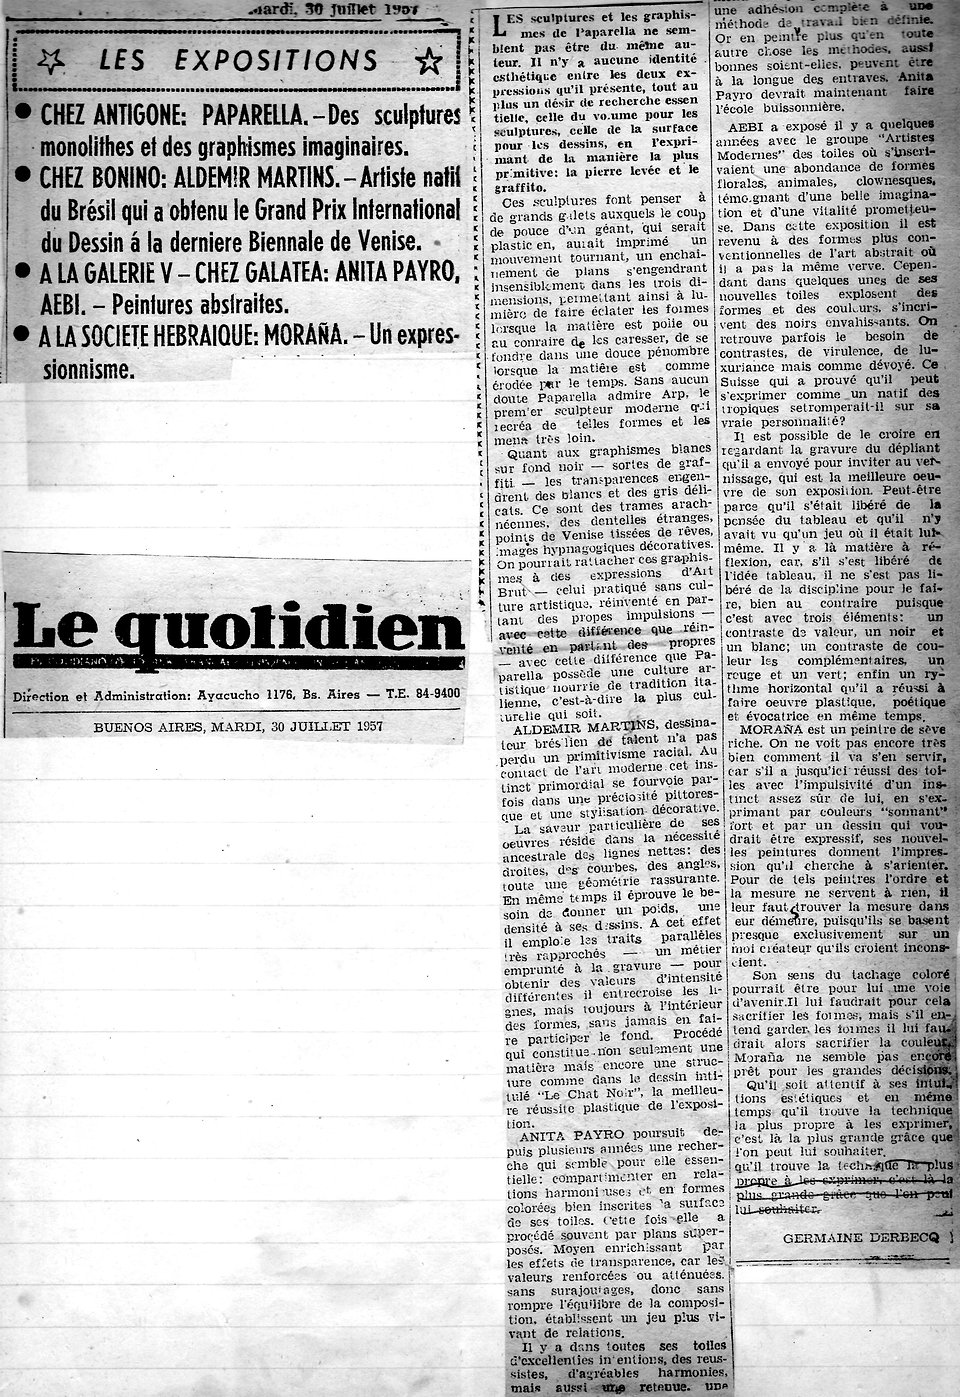 Le Quotidien2 - Chez Antigona.jpg